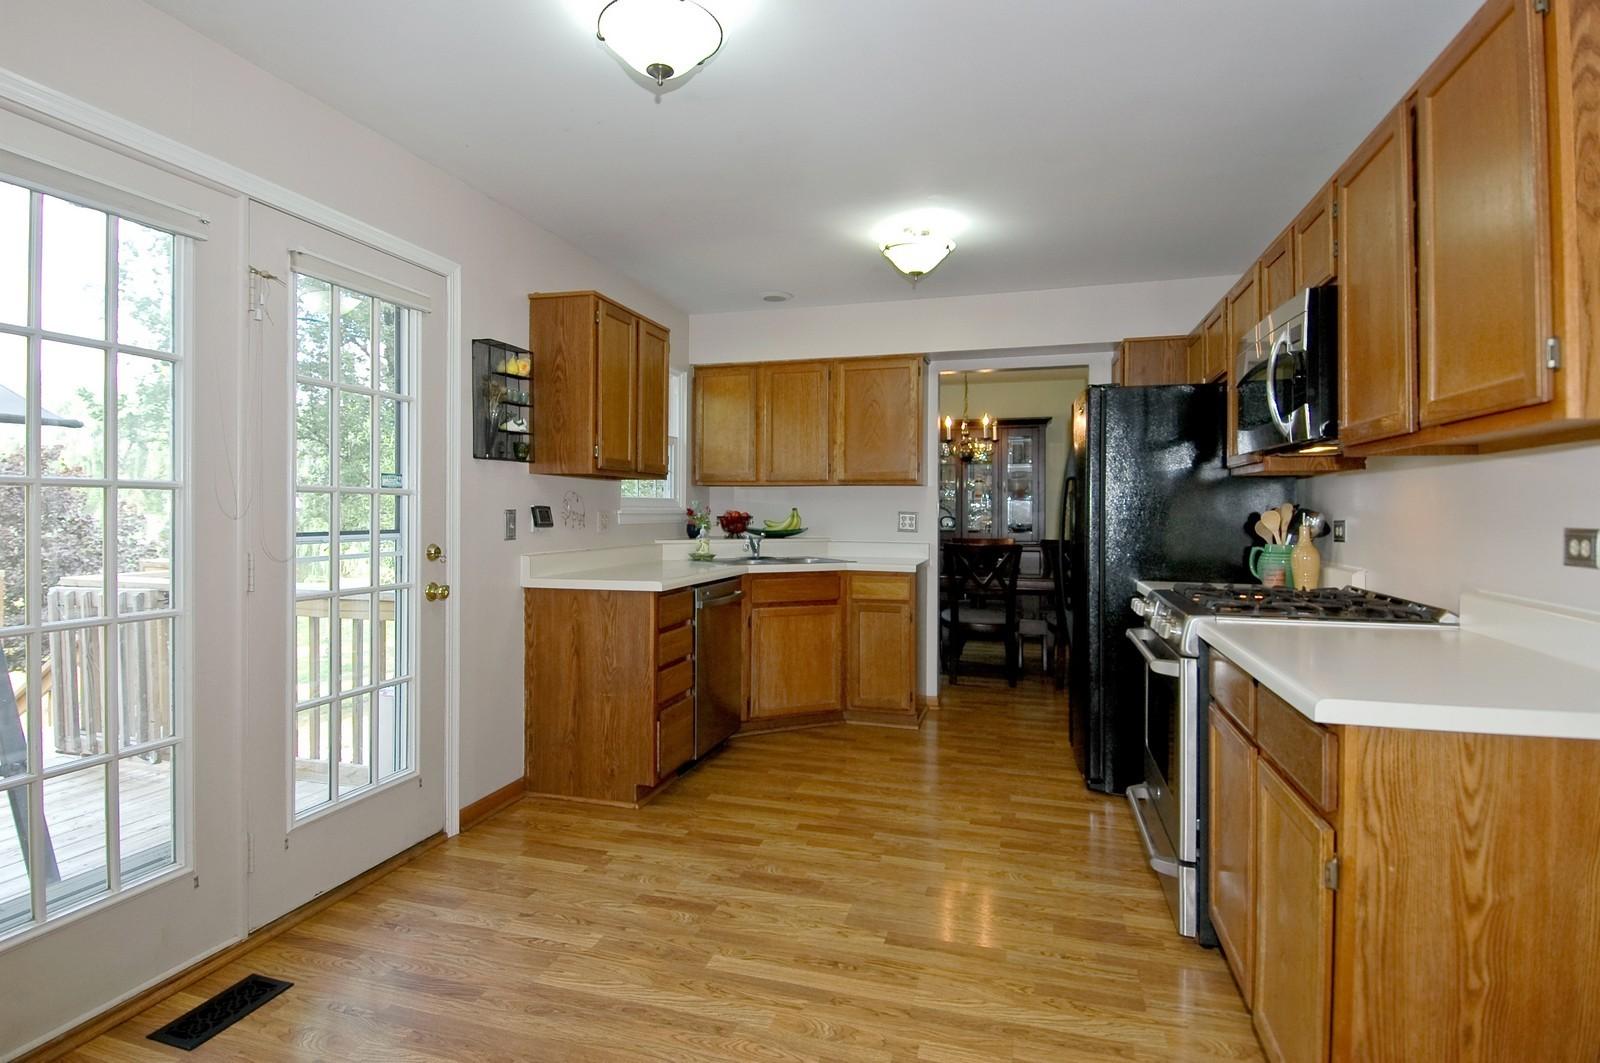 Real Estate Photography - 1604 Stockton Ln, Crystal Lake, IL, 60014 - Kitchen